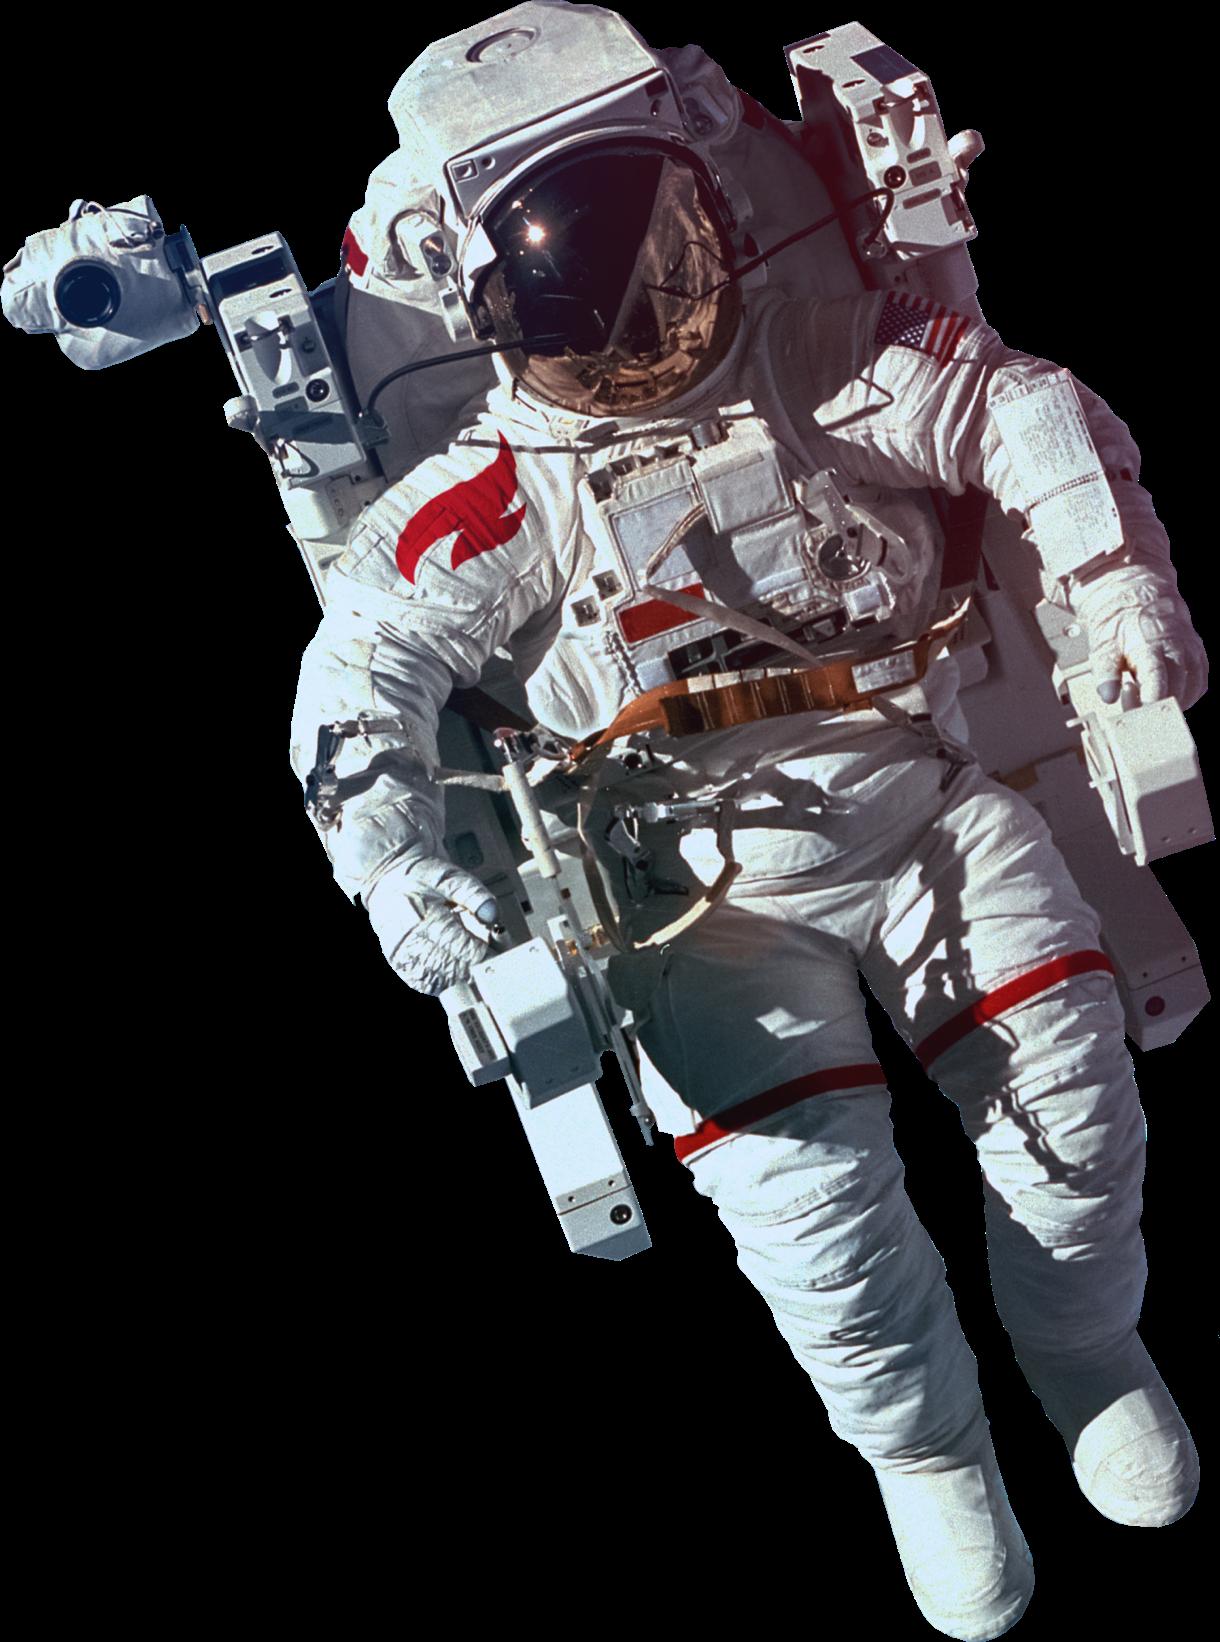 Astronaut | Black and white cartoon, Astronaut ...